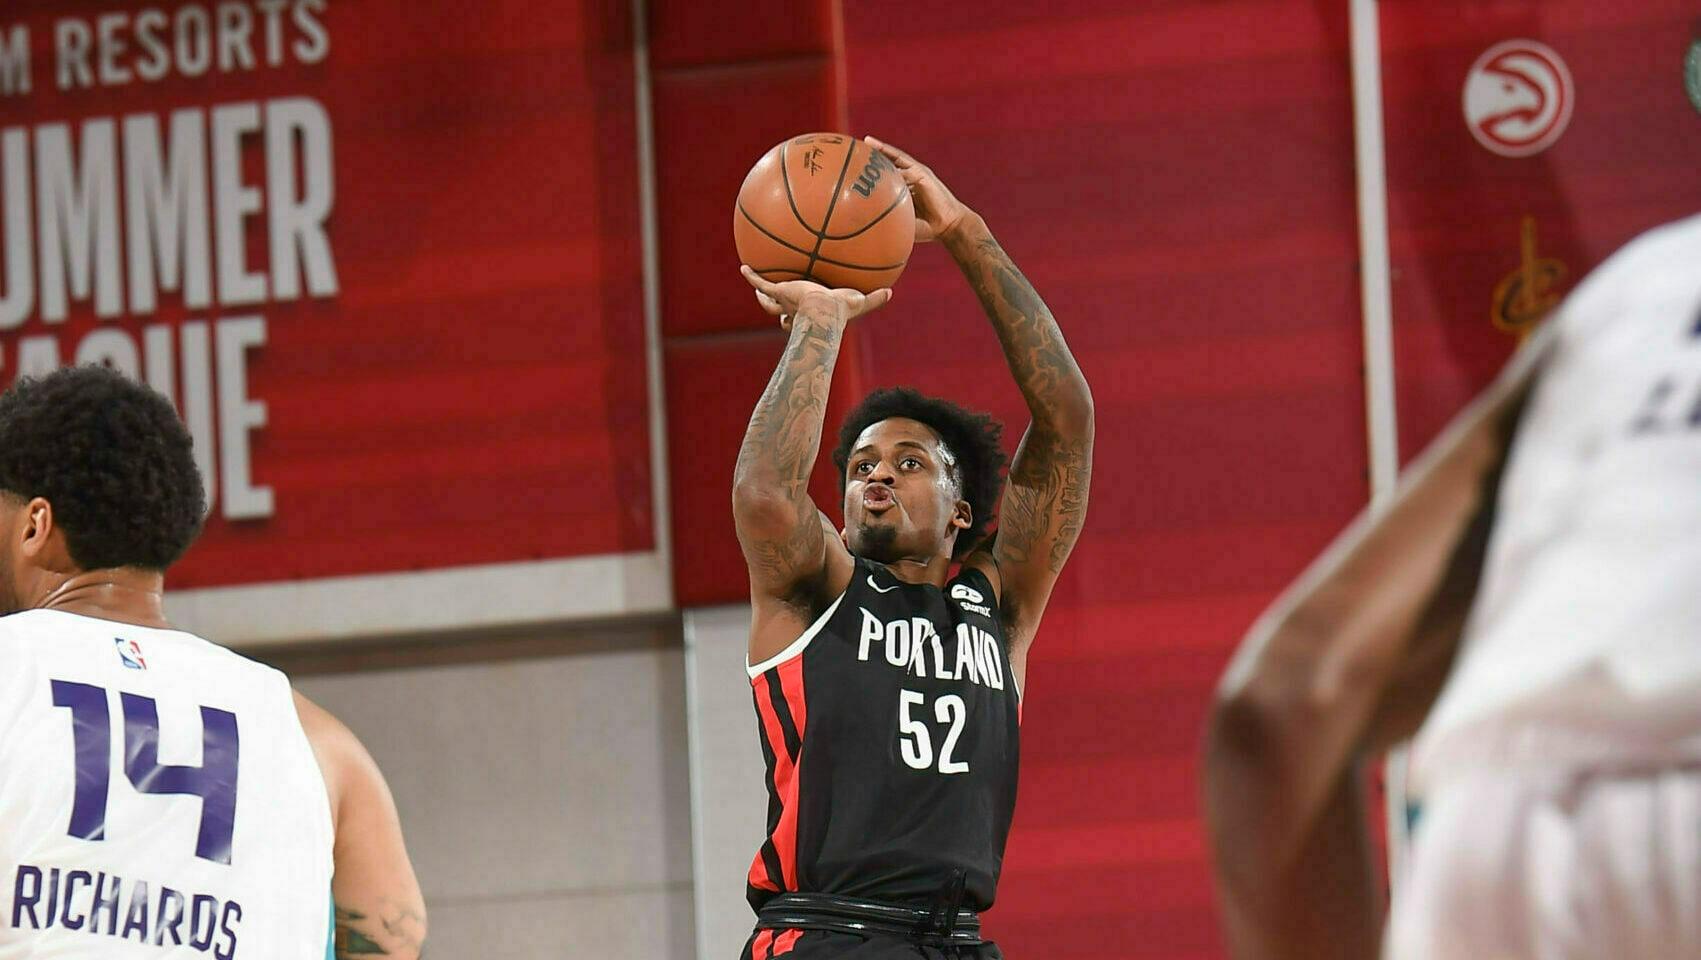 Las Vegas Summer League: Antonio Blakeney scores 27 points in Blazers' victory